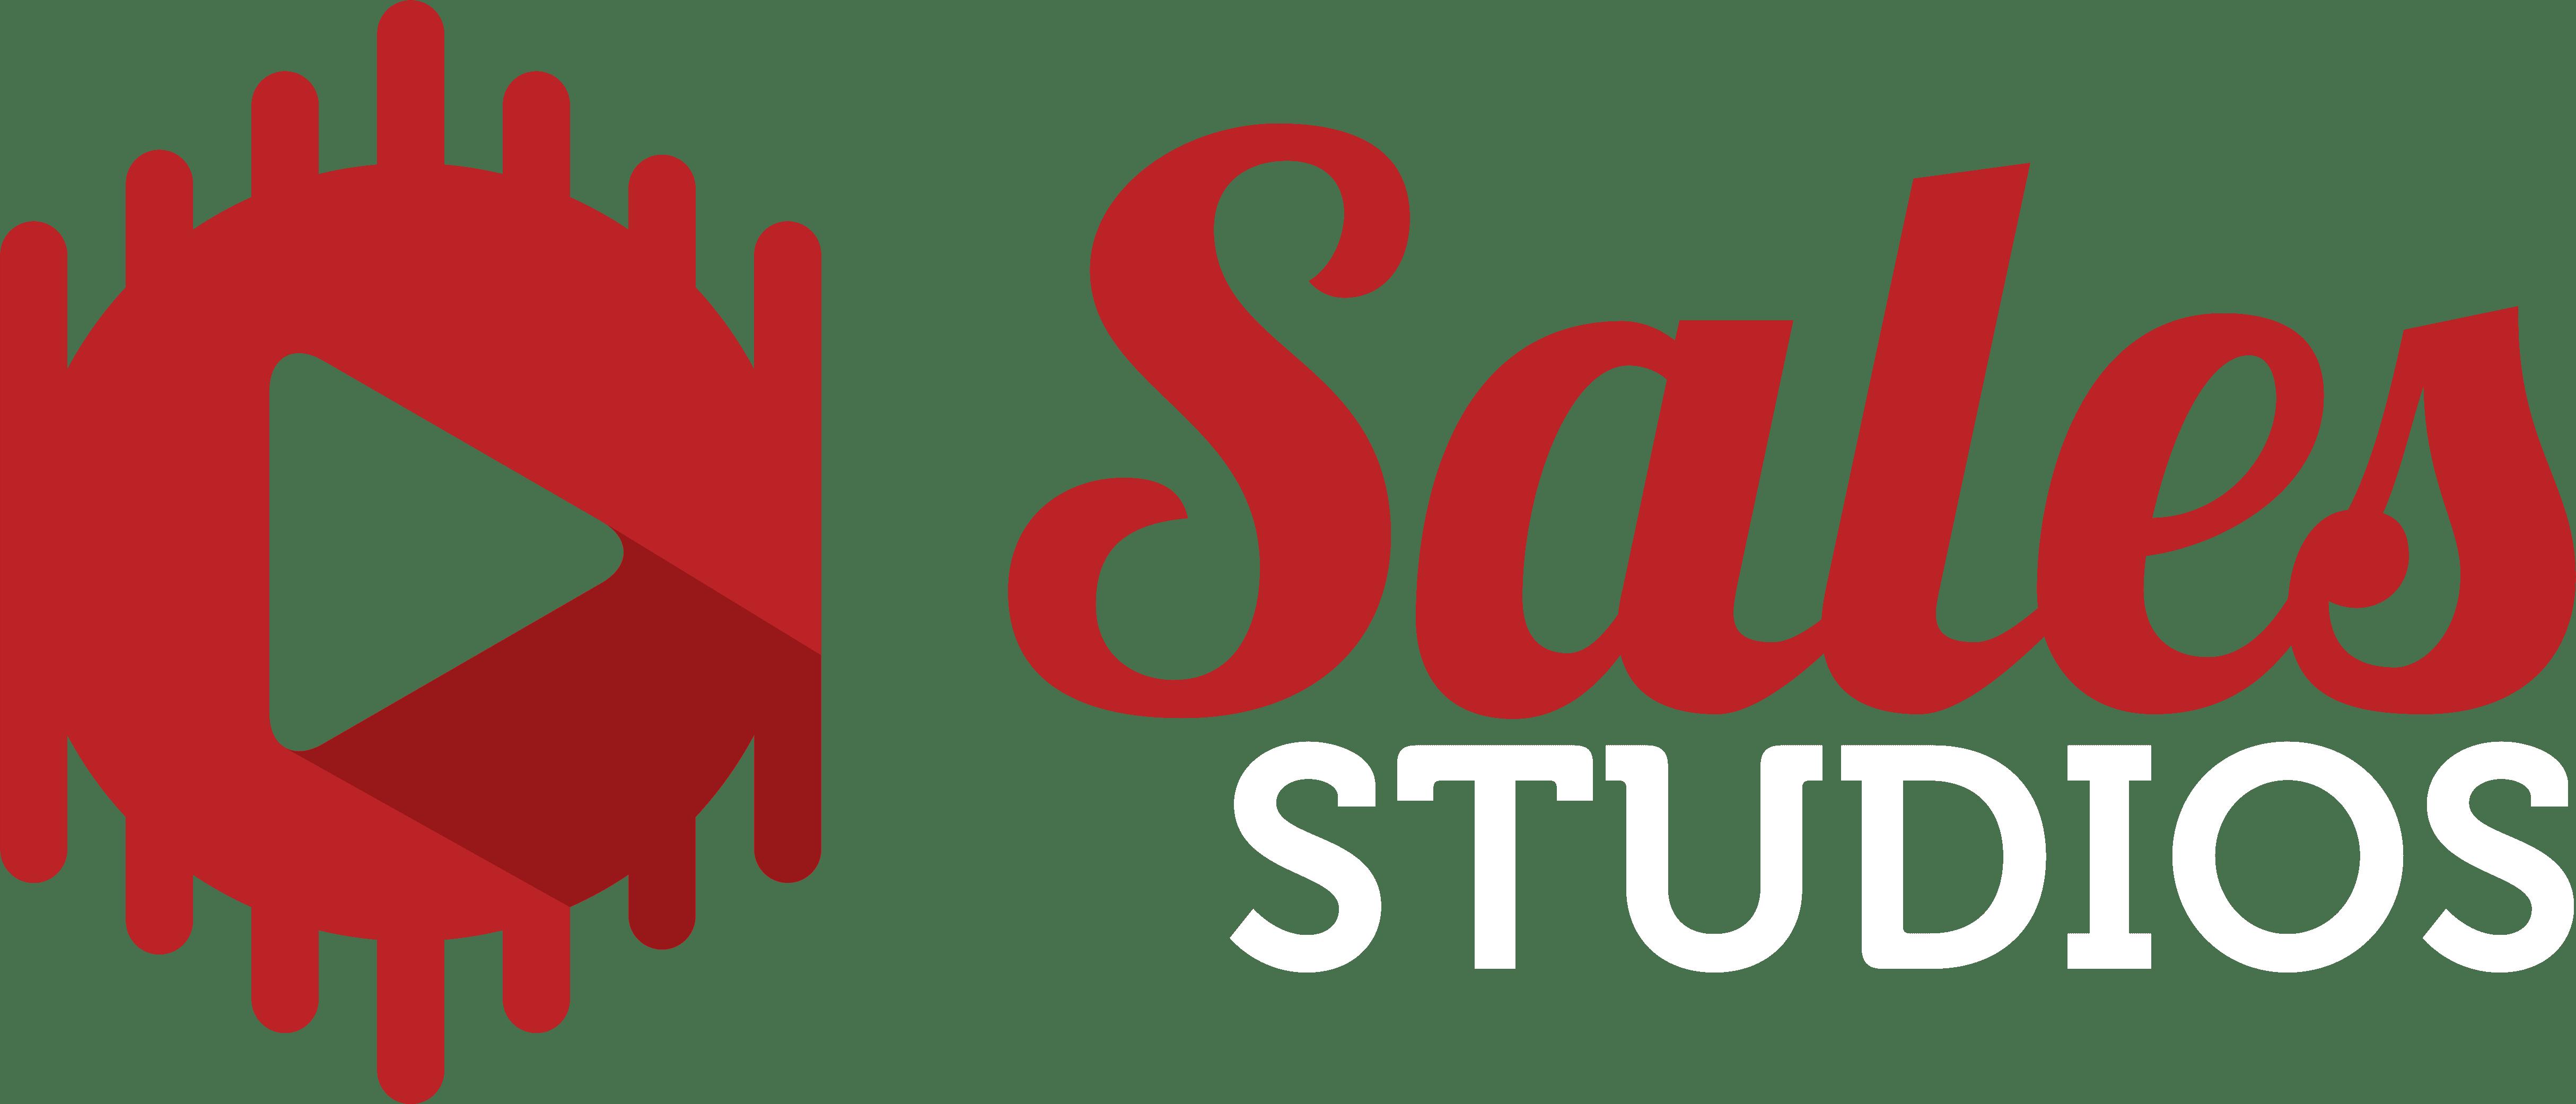 Sales Studios Final Black BG compreso